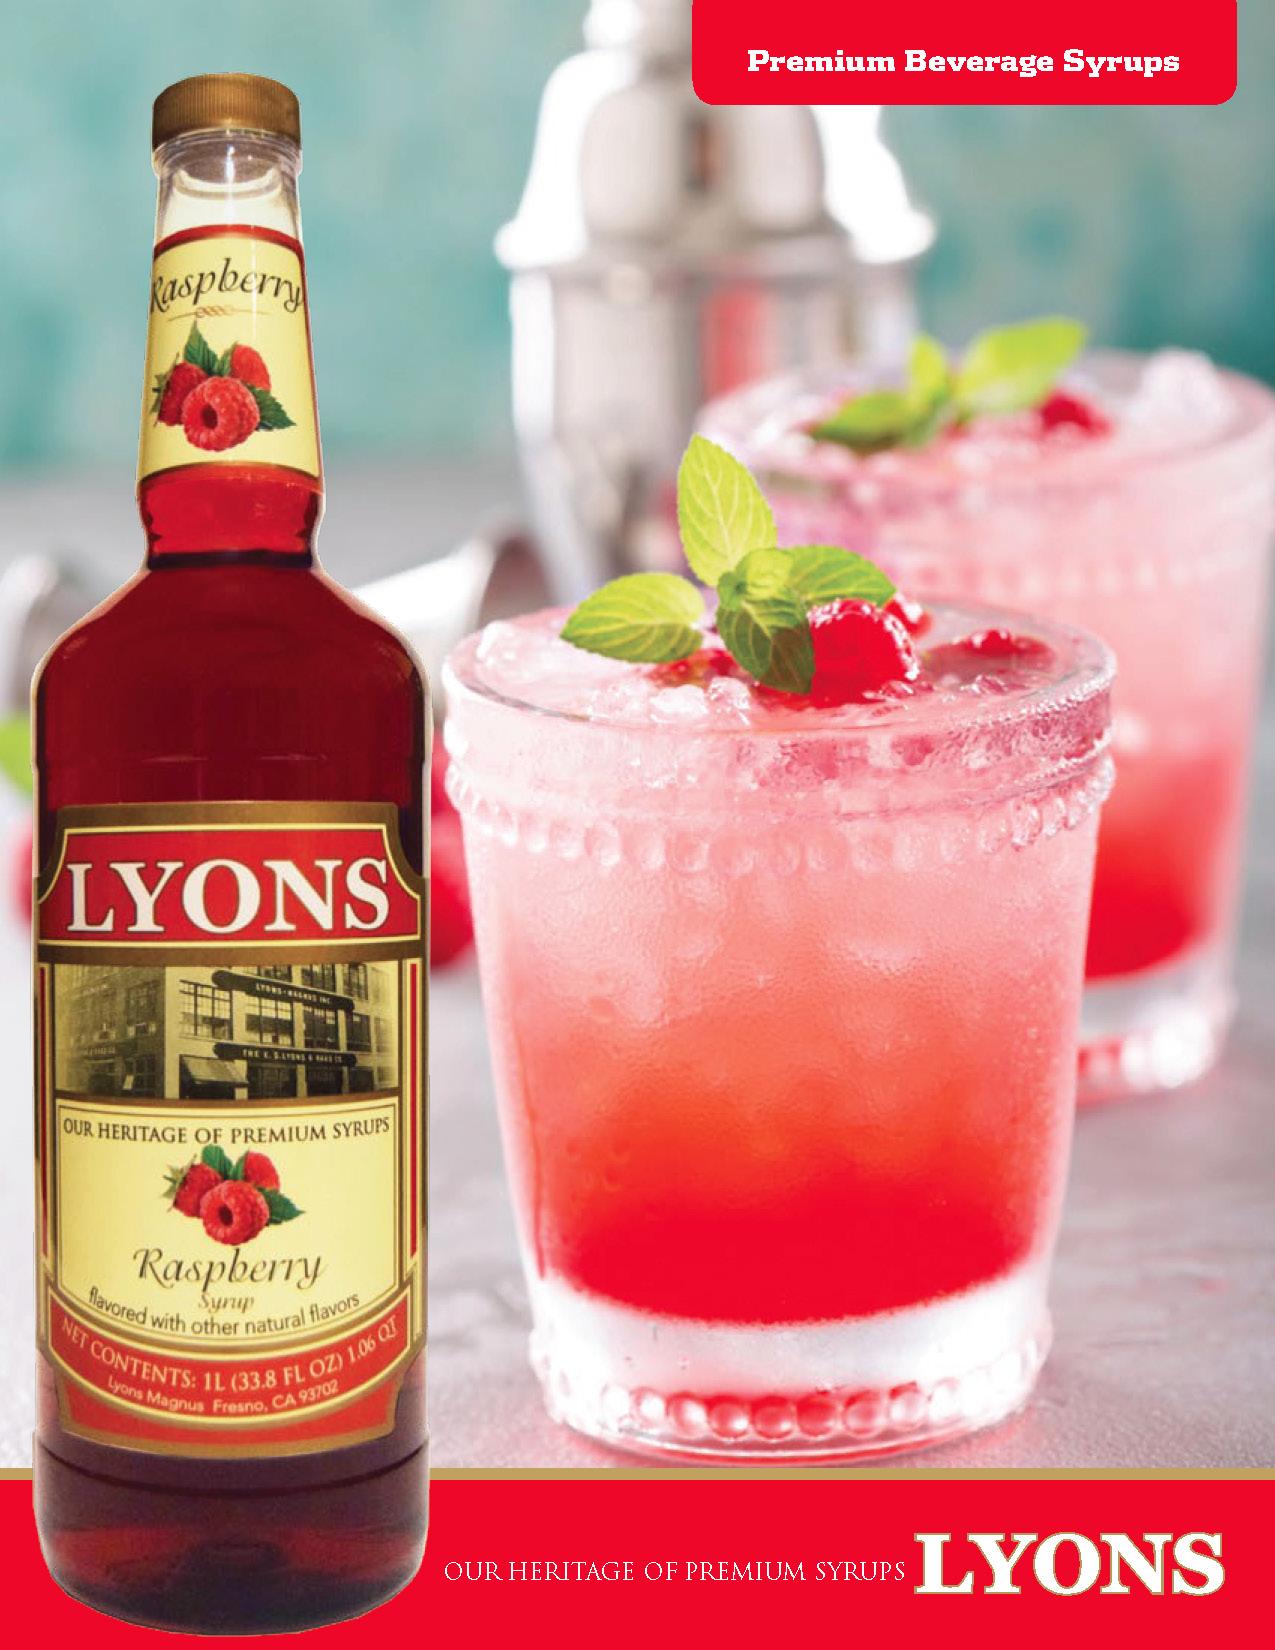 Premium Beverage Syrups